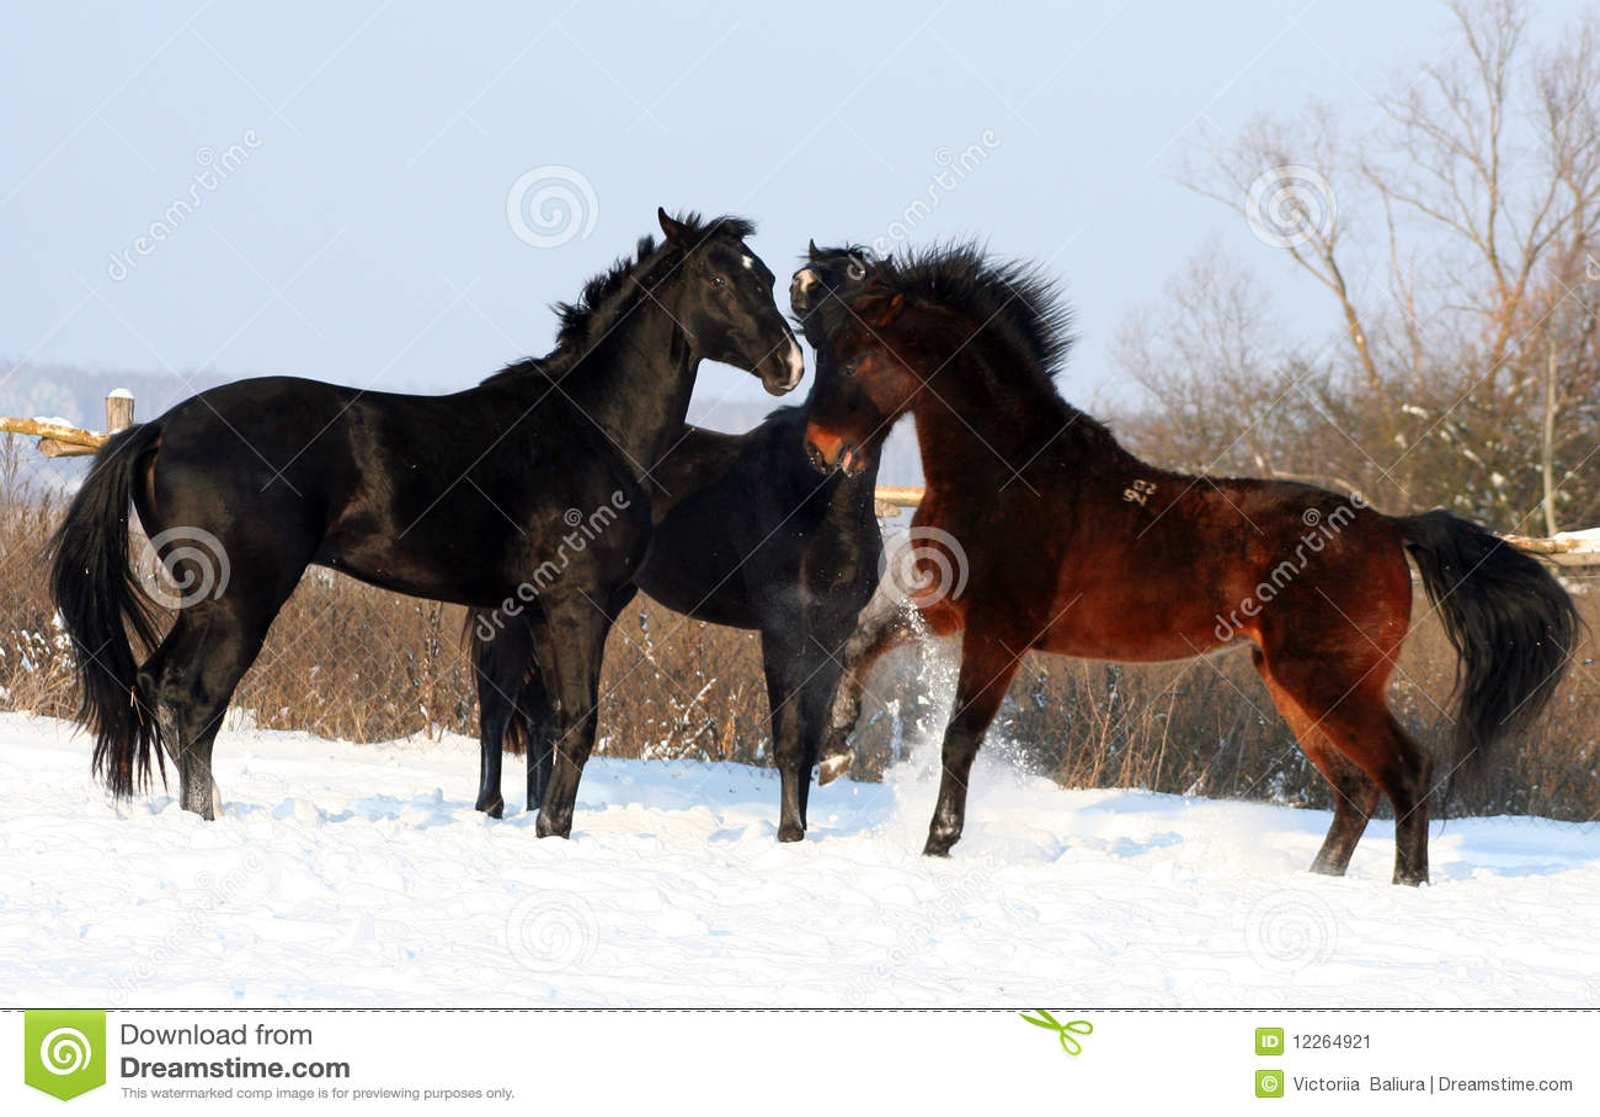 drei pferde im schnee stockbild bild 12264921. Black Bedroom Furniture Sets. Home Design Ideas